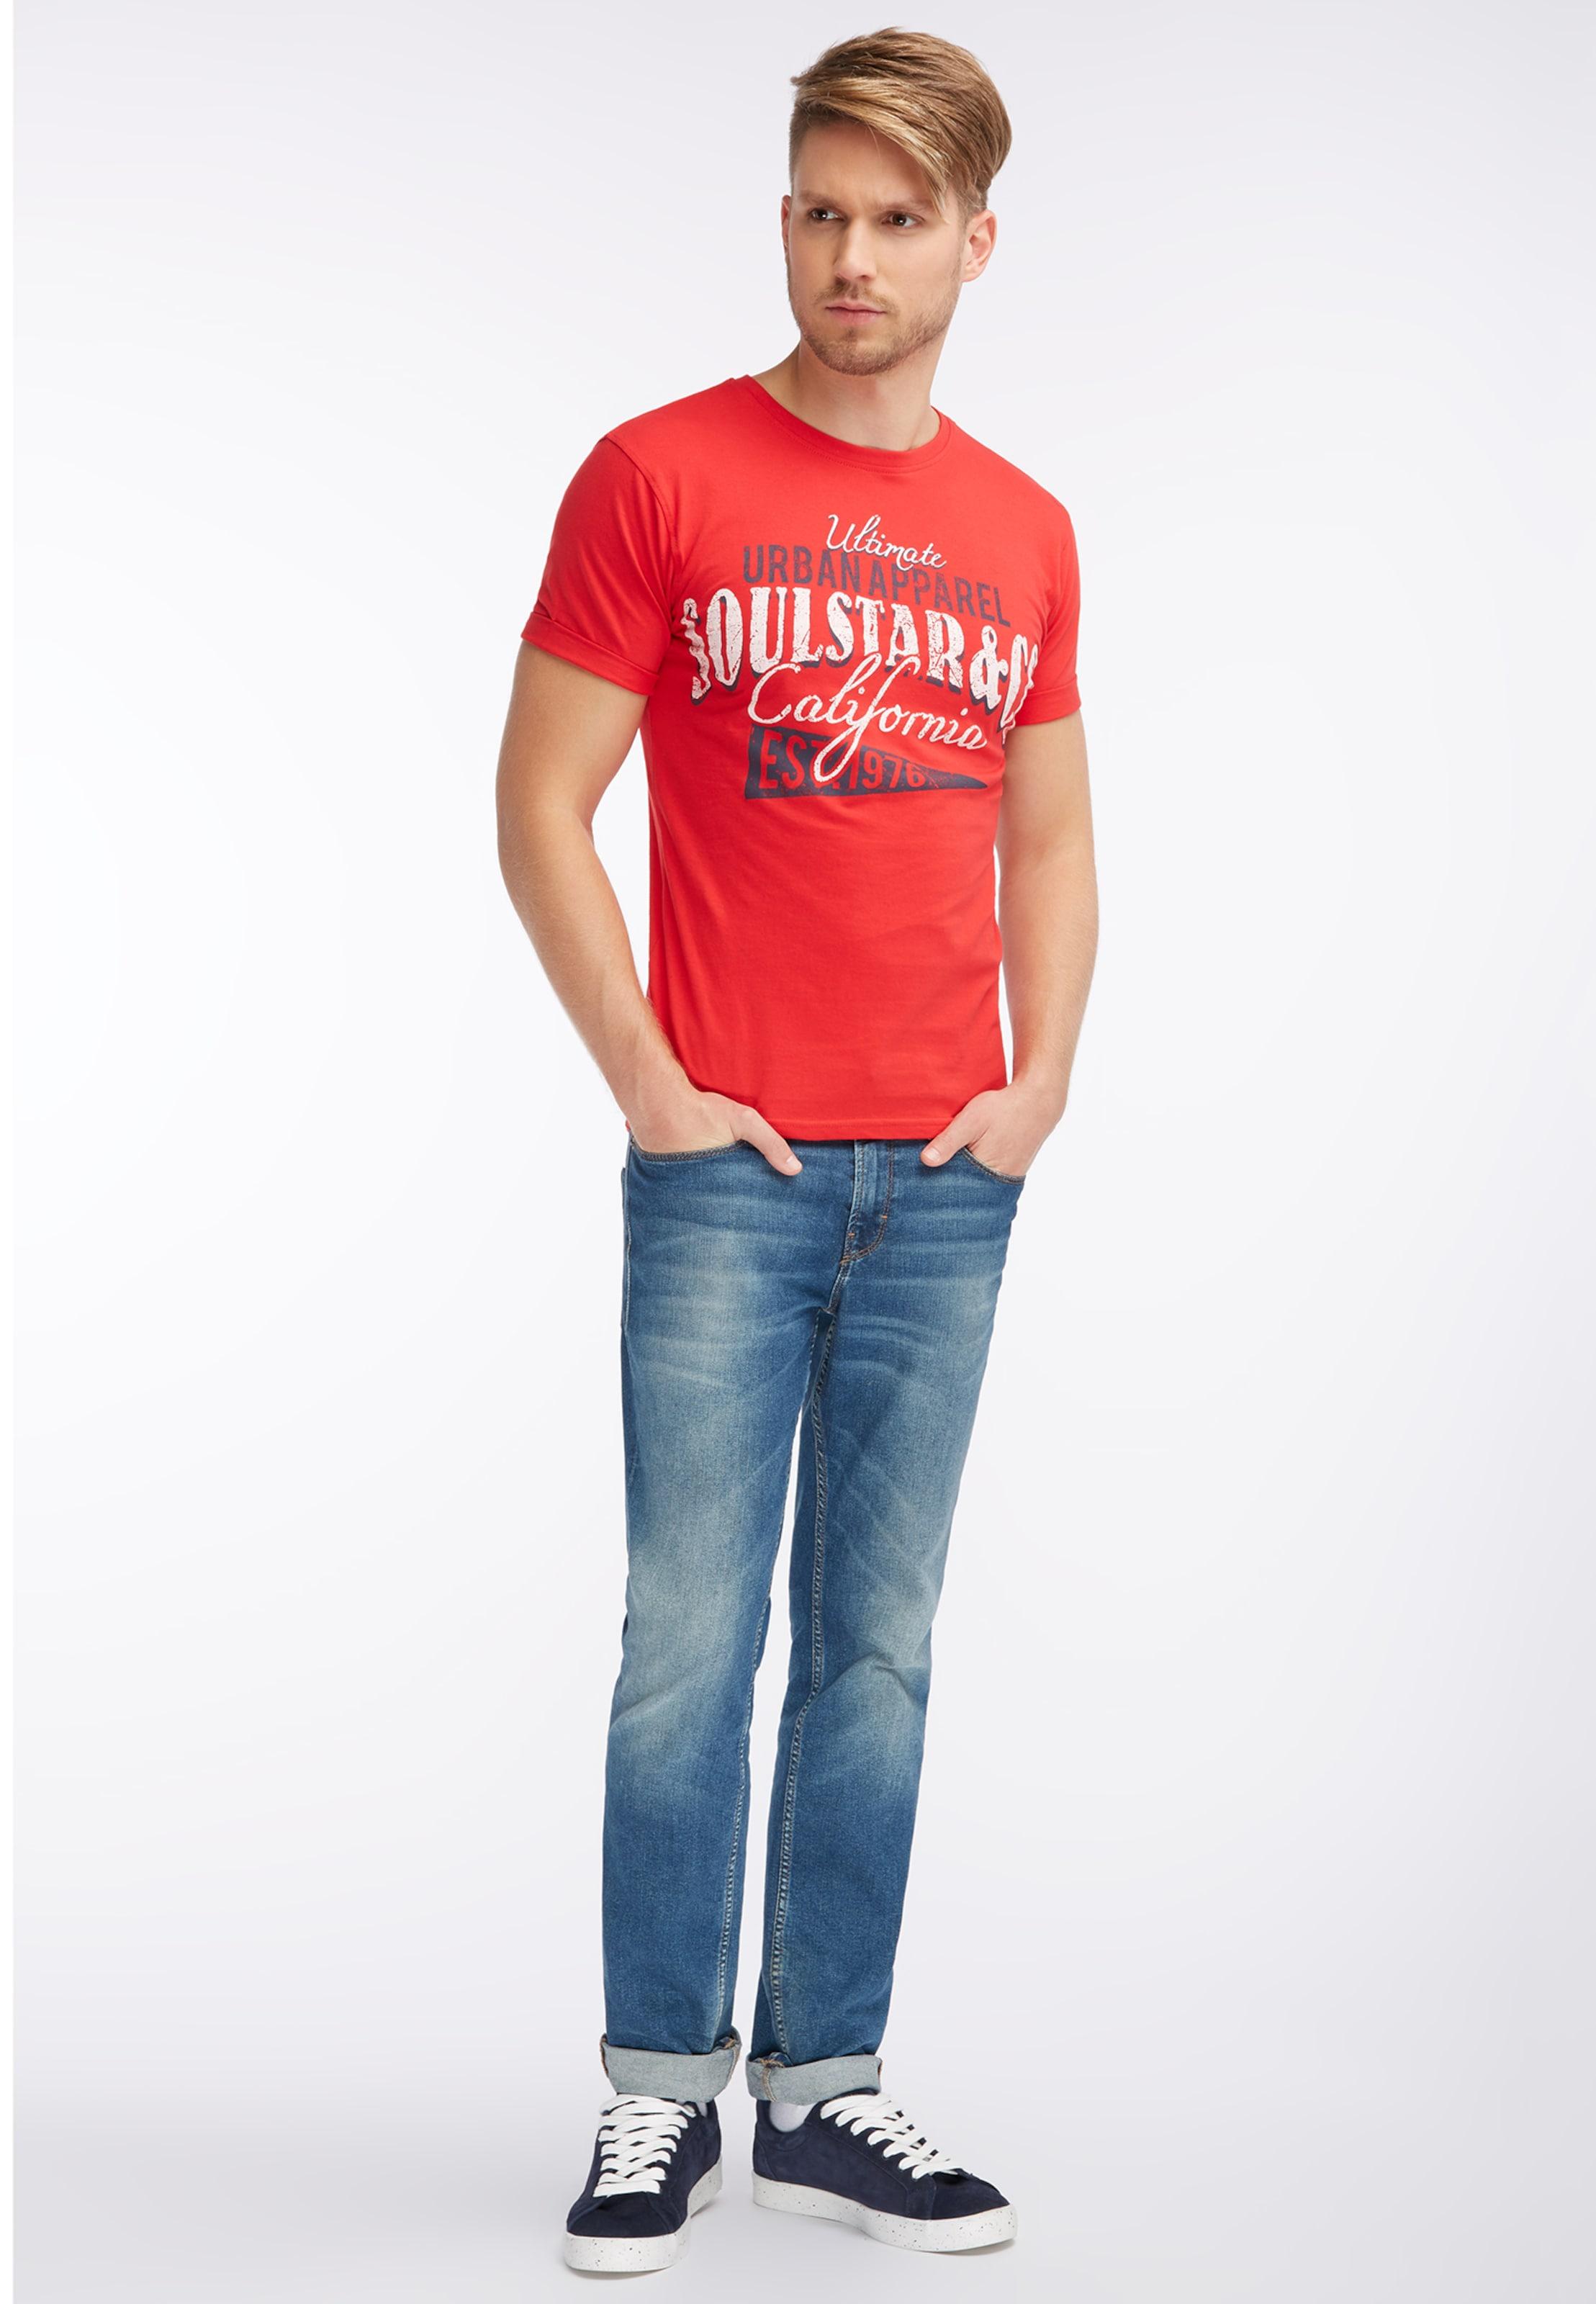 Blanc En Soulstar shirt T RougeNoir m0wvn8ON